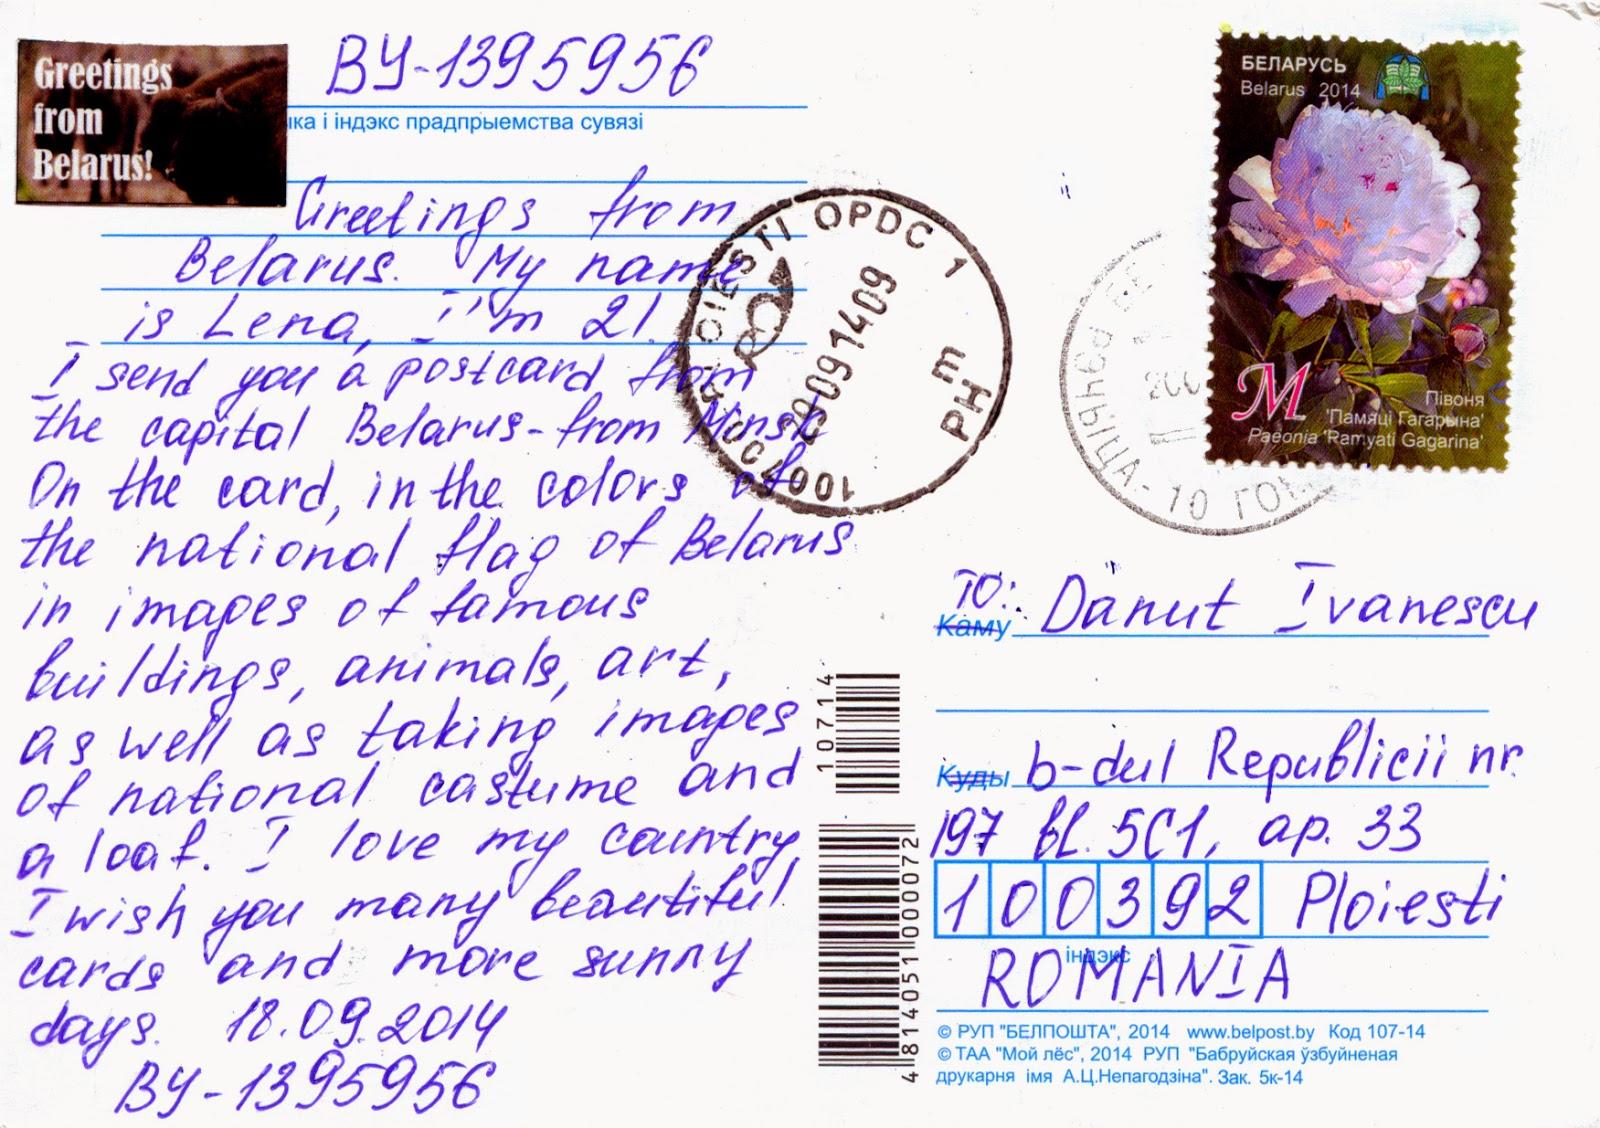 Russian Or Ruthenian And Belarusian 8